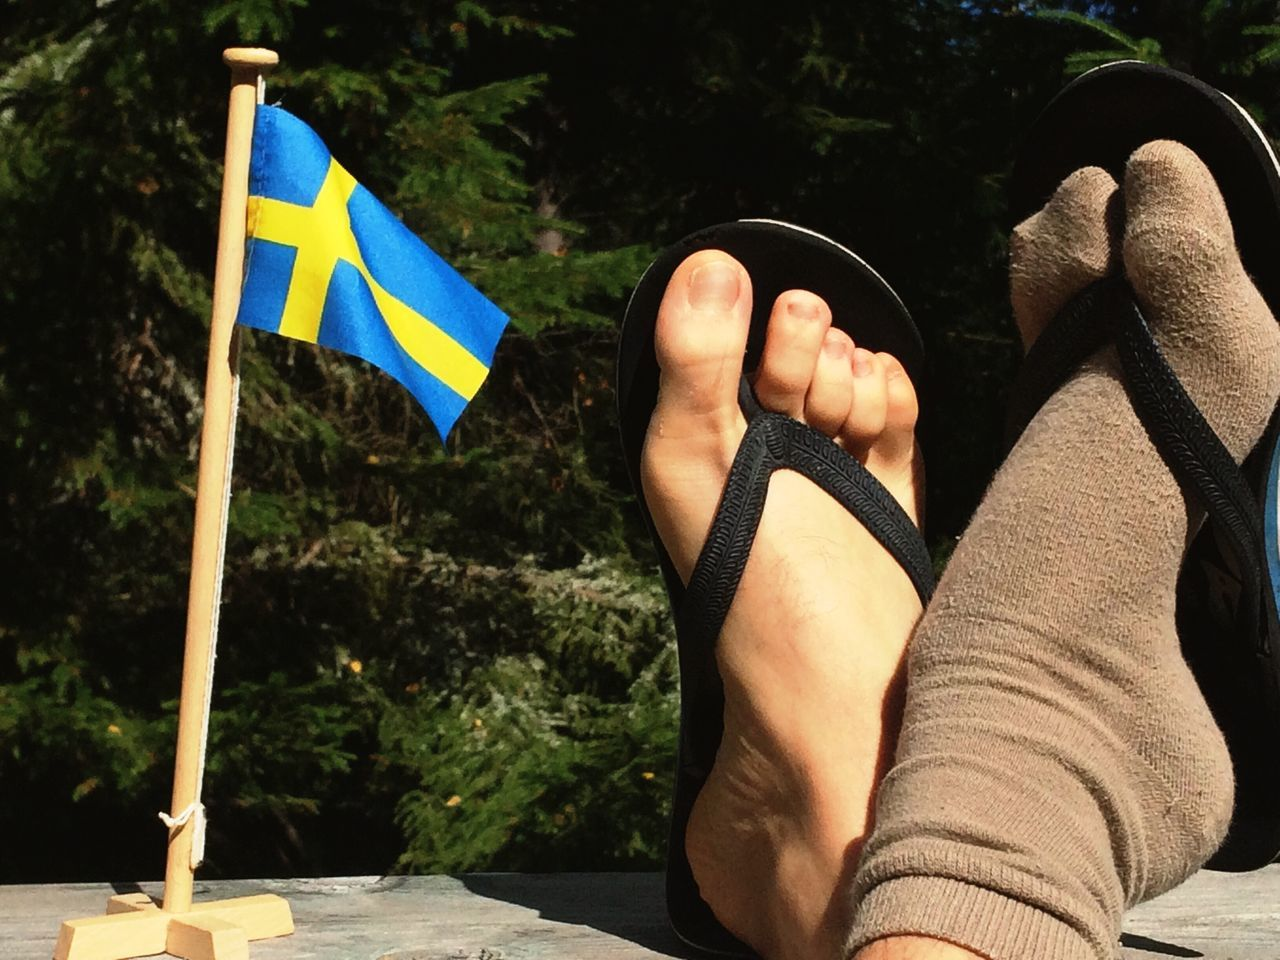 EyeEm Diversity Barefoot Flag One Person Human Leg Human Body Part Outdoors Adult